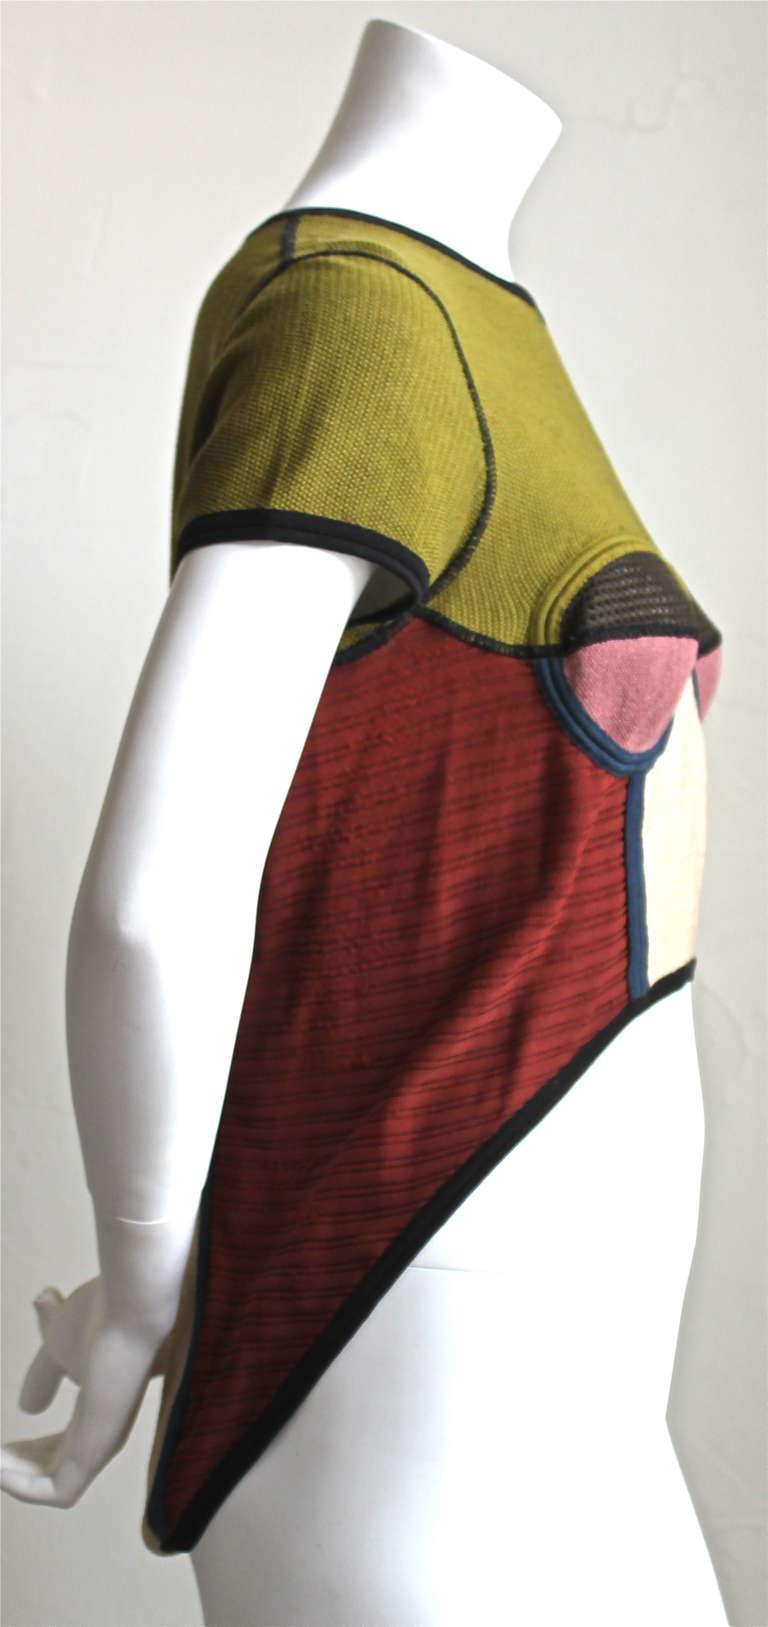 very rare 1990's JEAN PAUL GAULTIER knit top with hi-low hemline 2